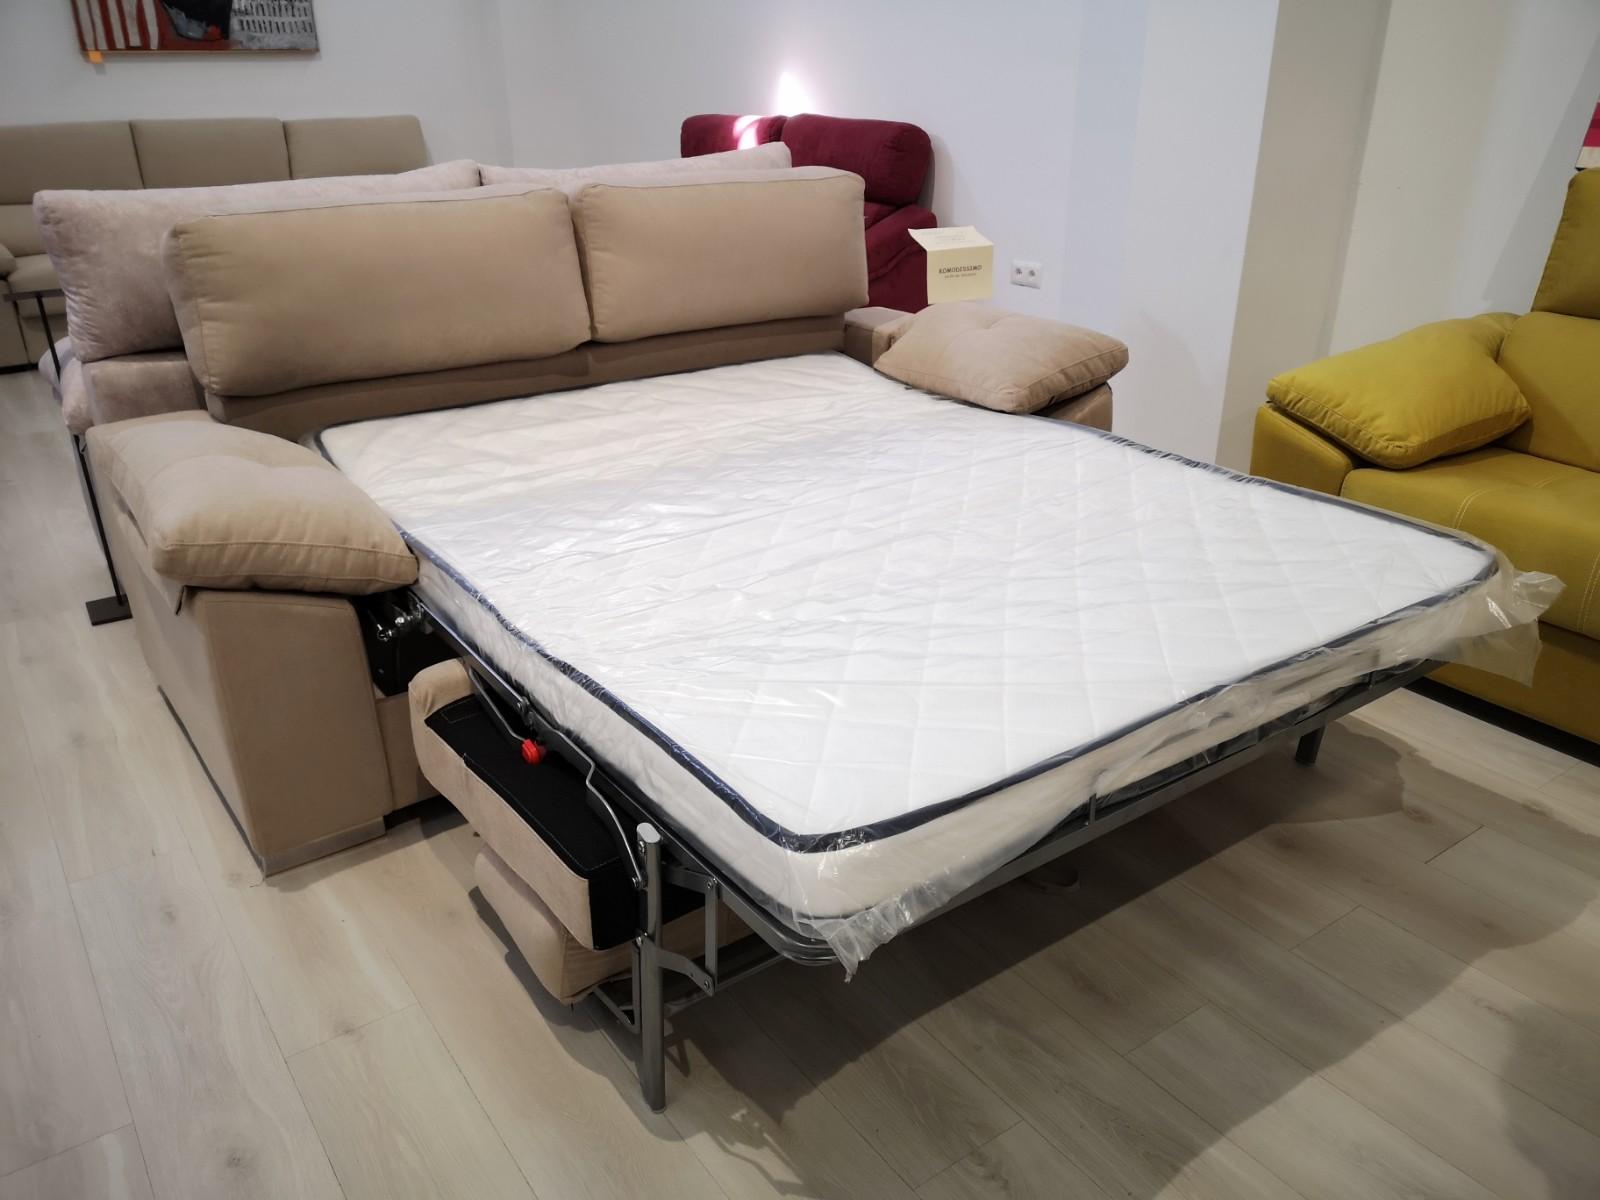 sofá cama komodissimo